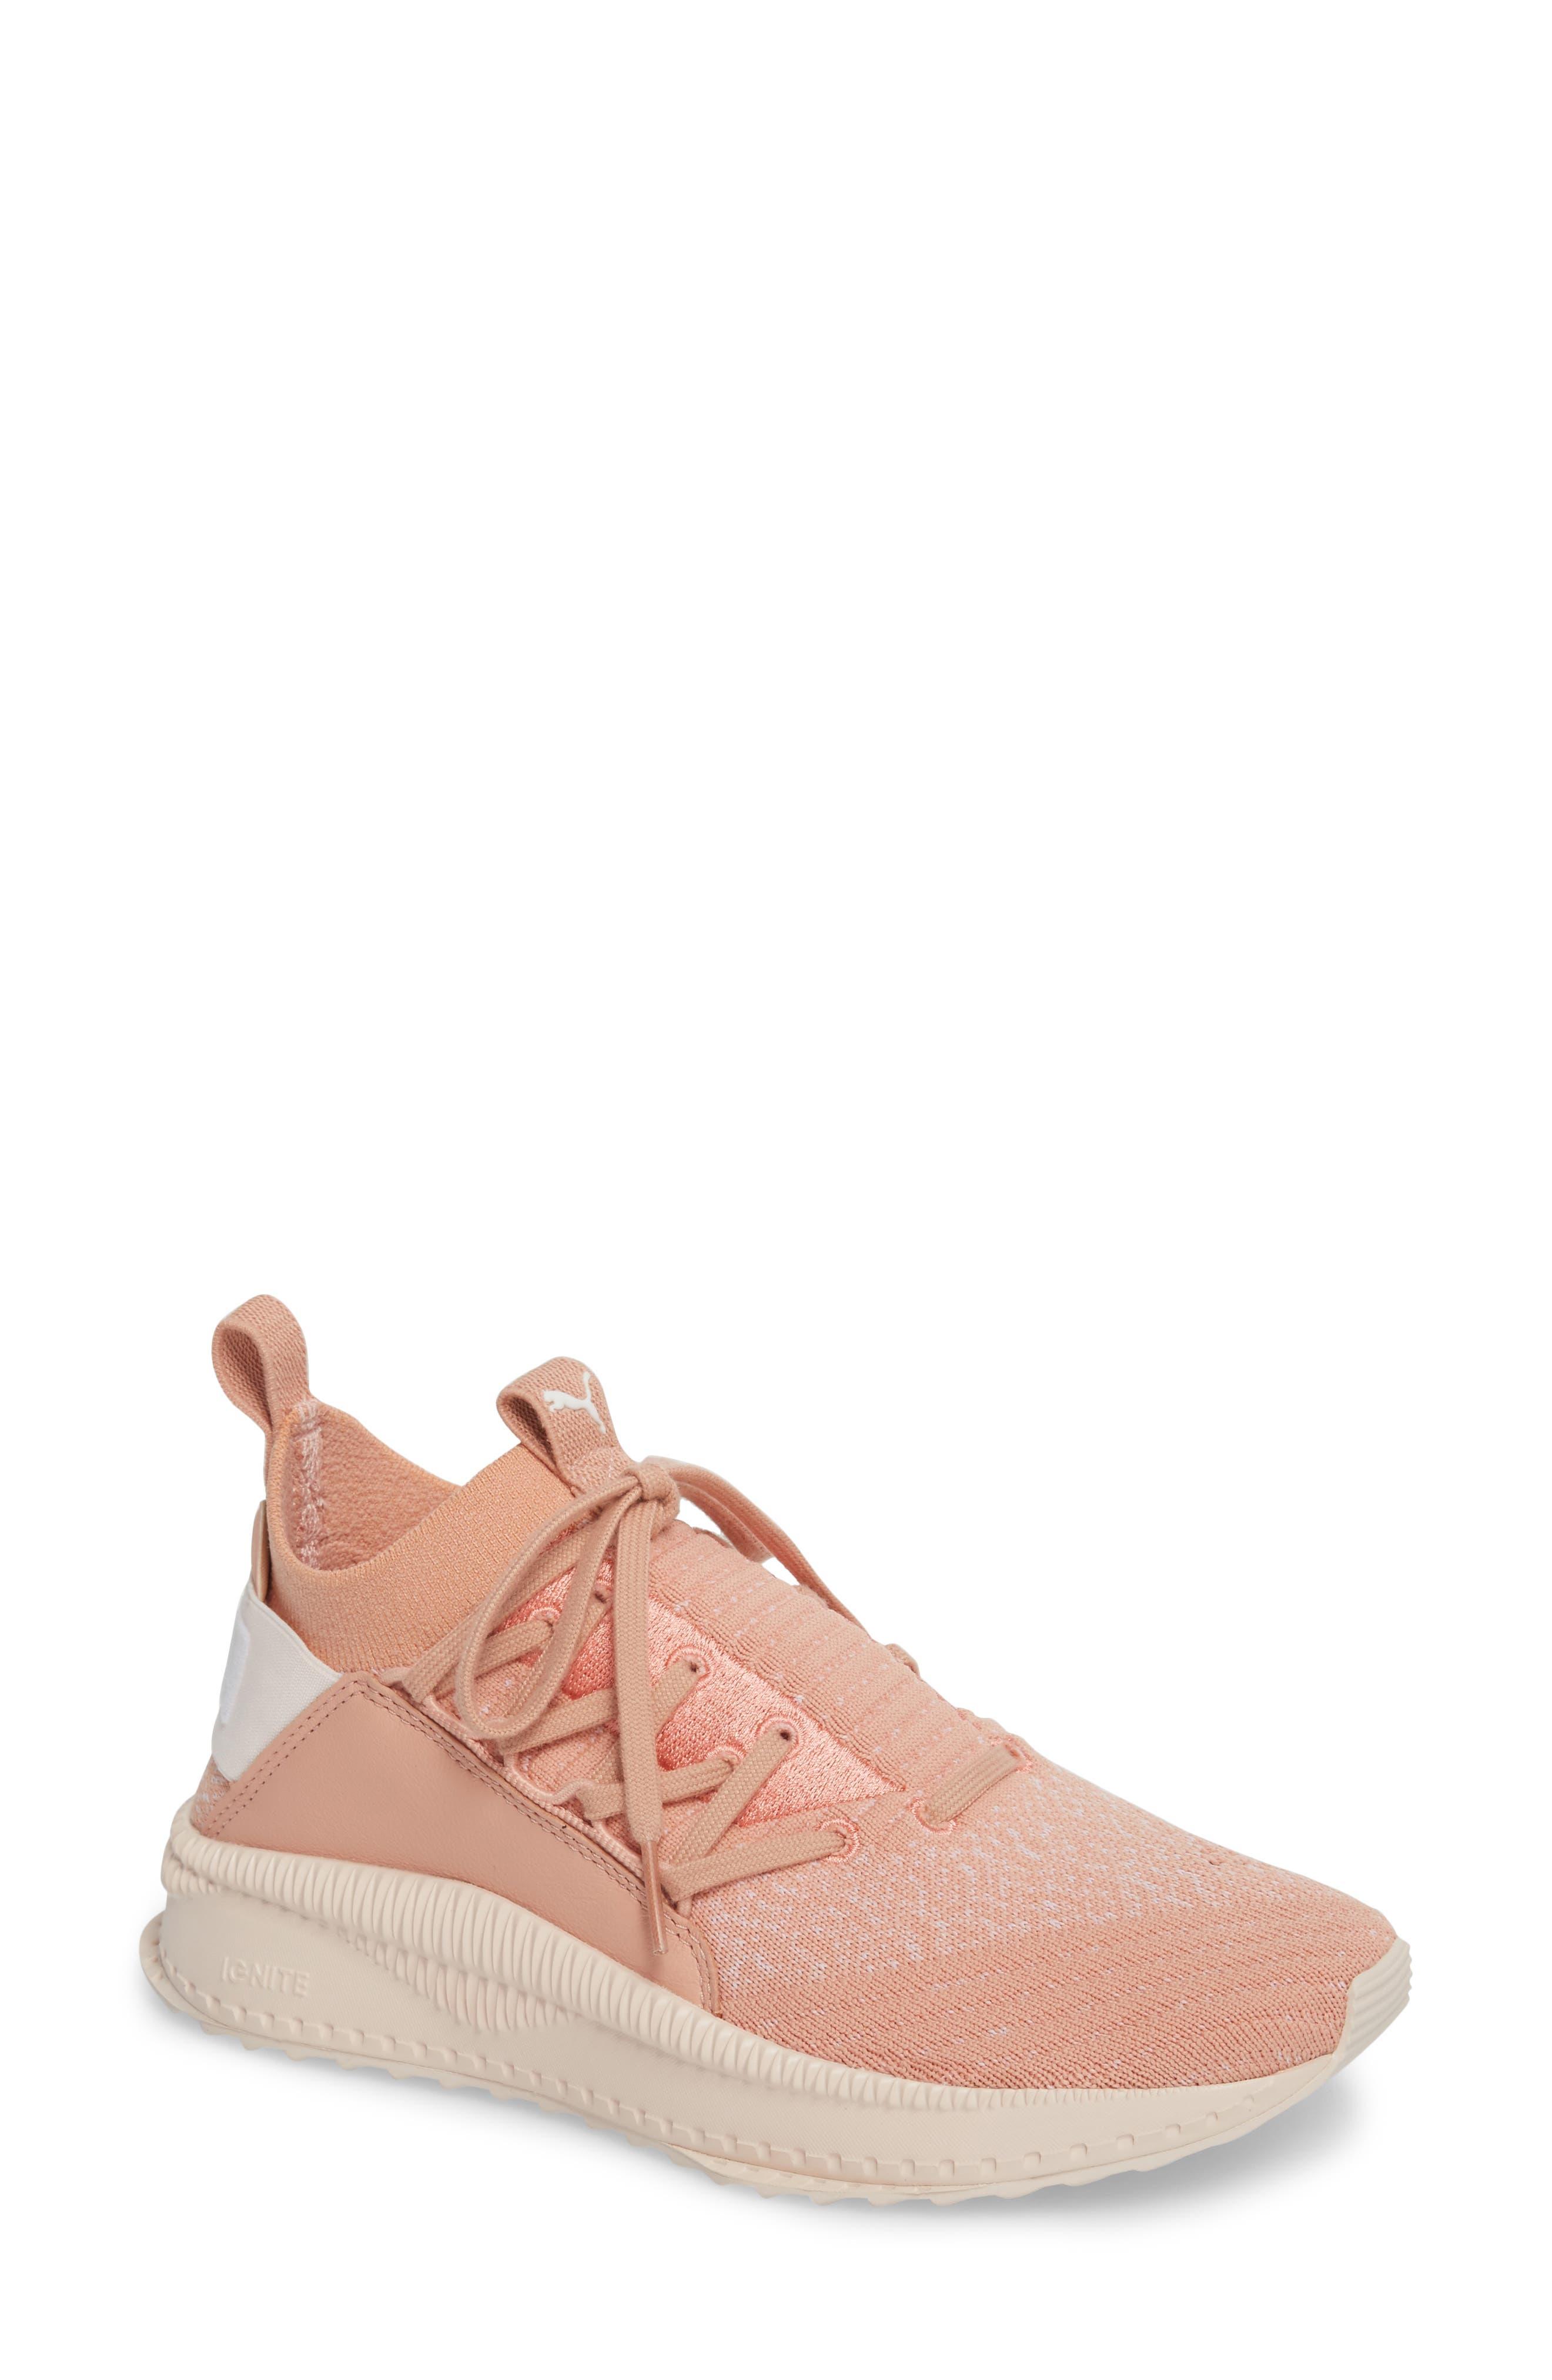 Tsugi Jun Knit Sneaker,                             Main thumbnail 7, color,